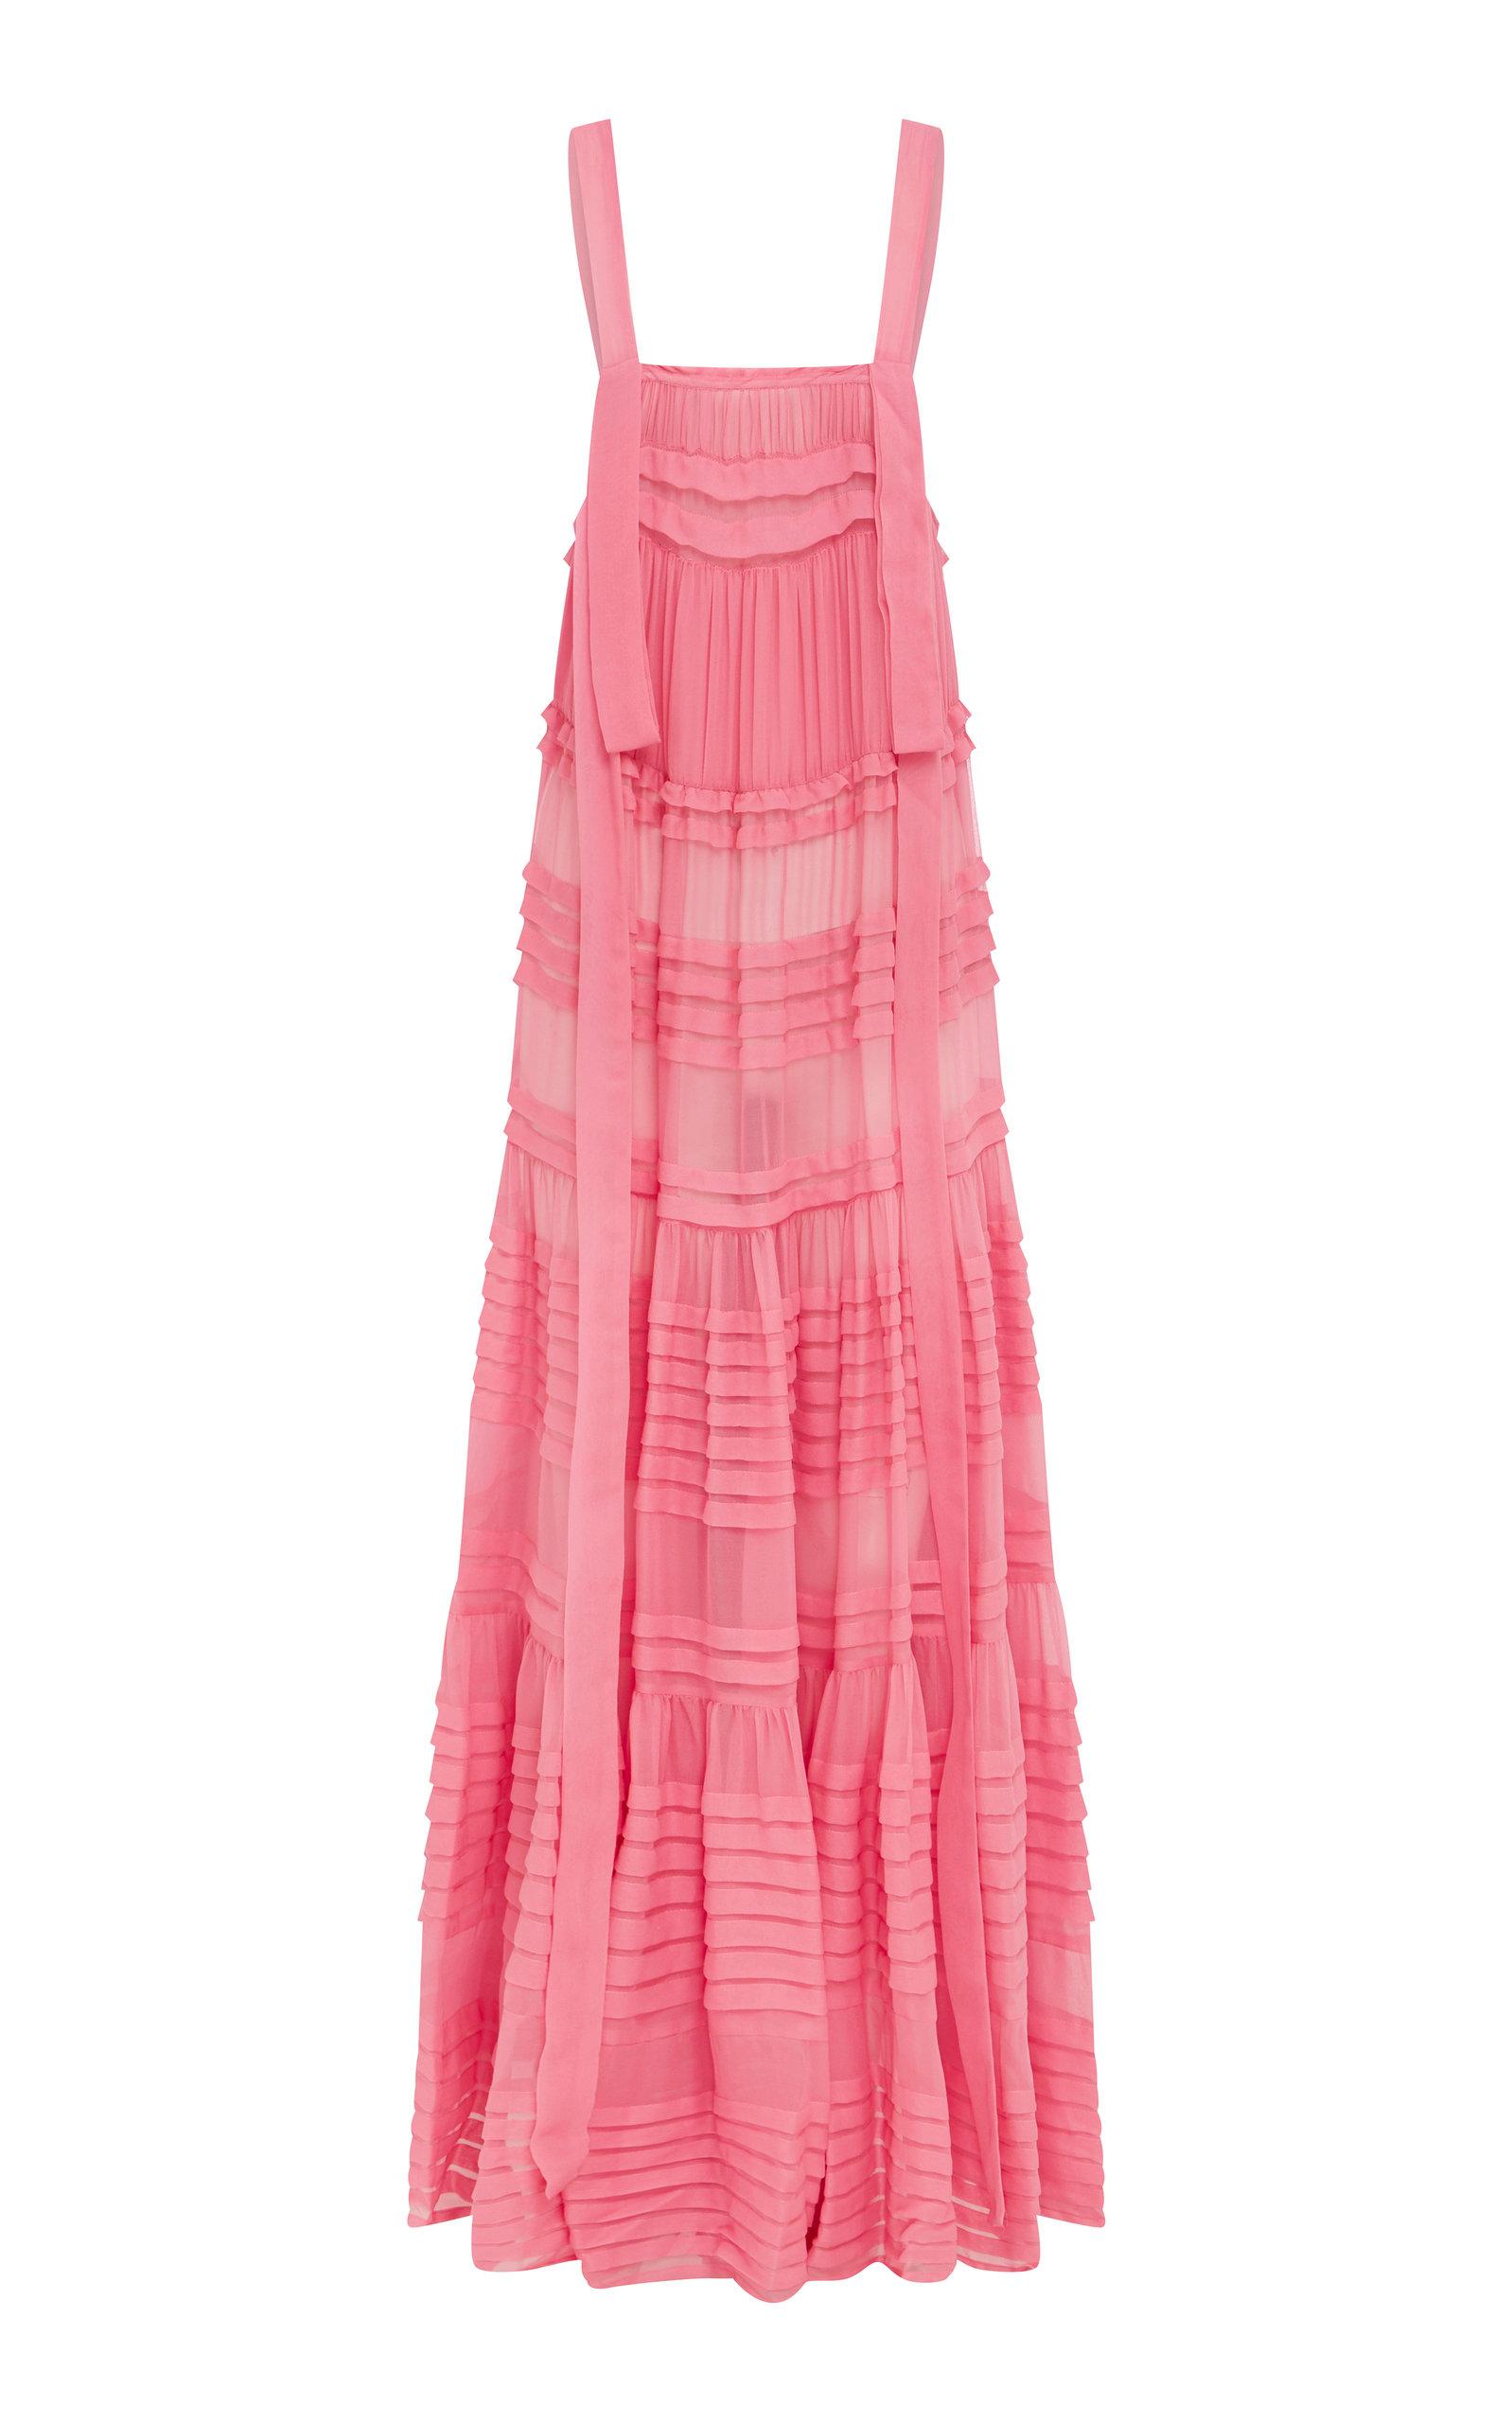 Buy LEE MATHEWS Kitty Ruffled Silk-Chiffon Maxi Dress online, shop LEE MATHEWS at the best price